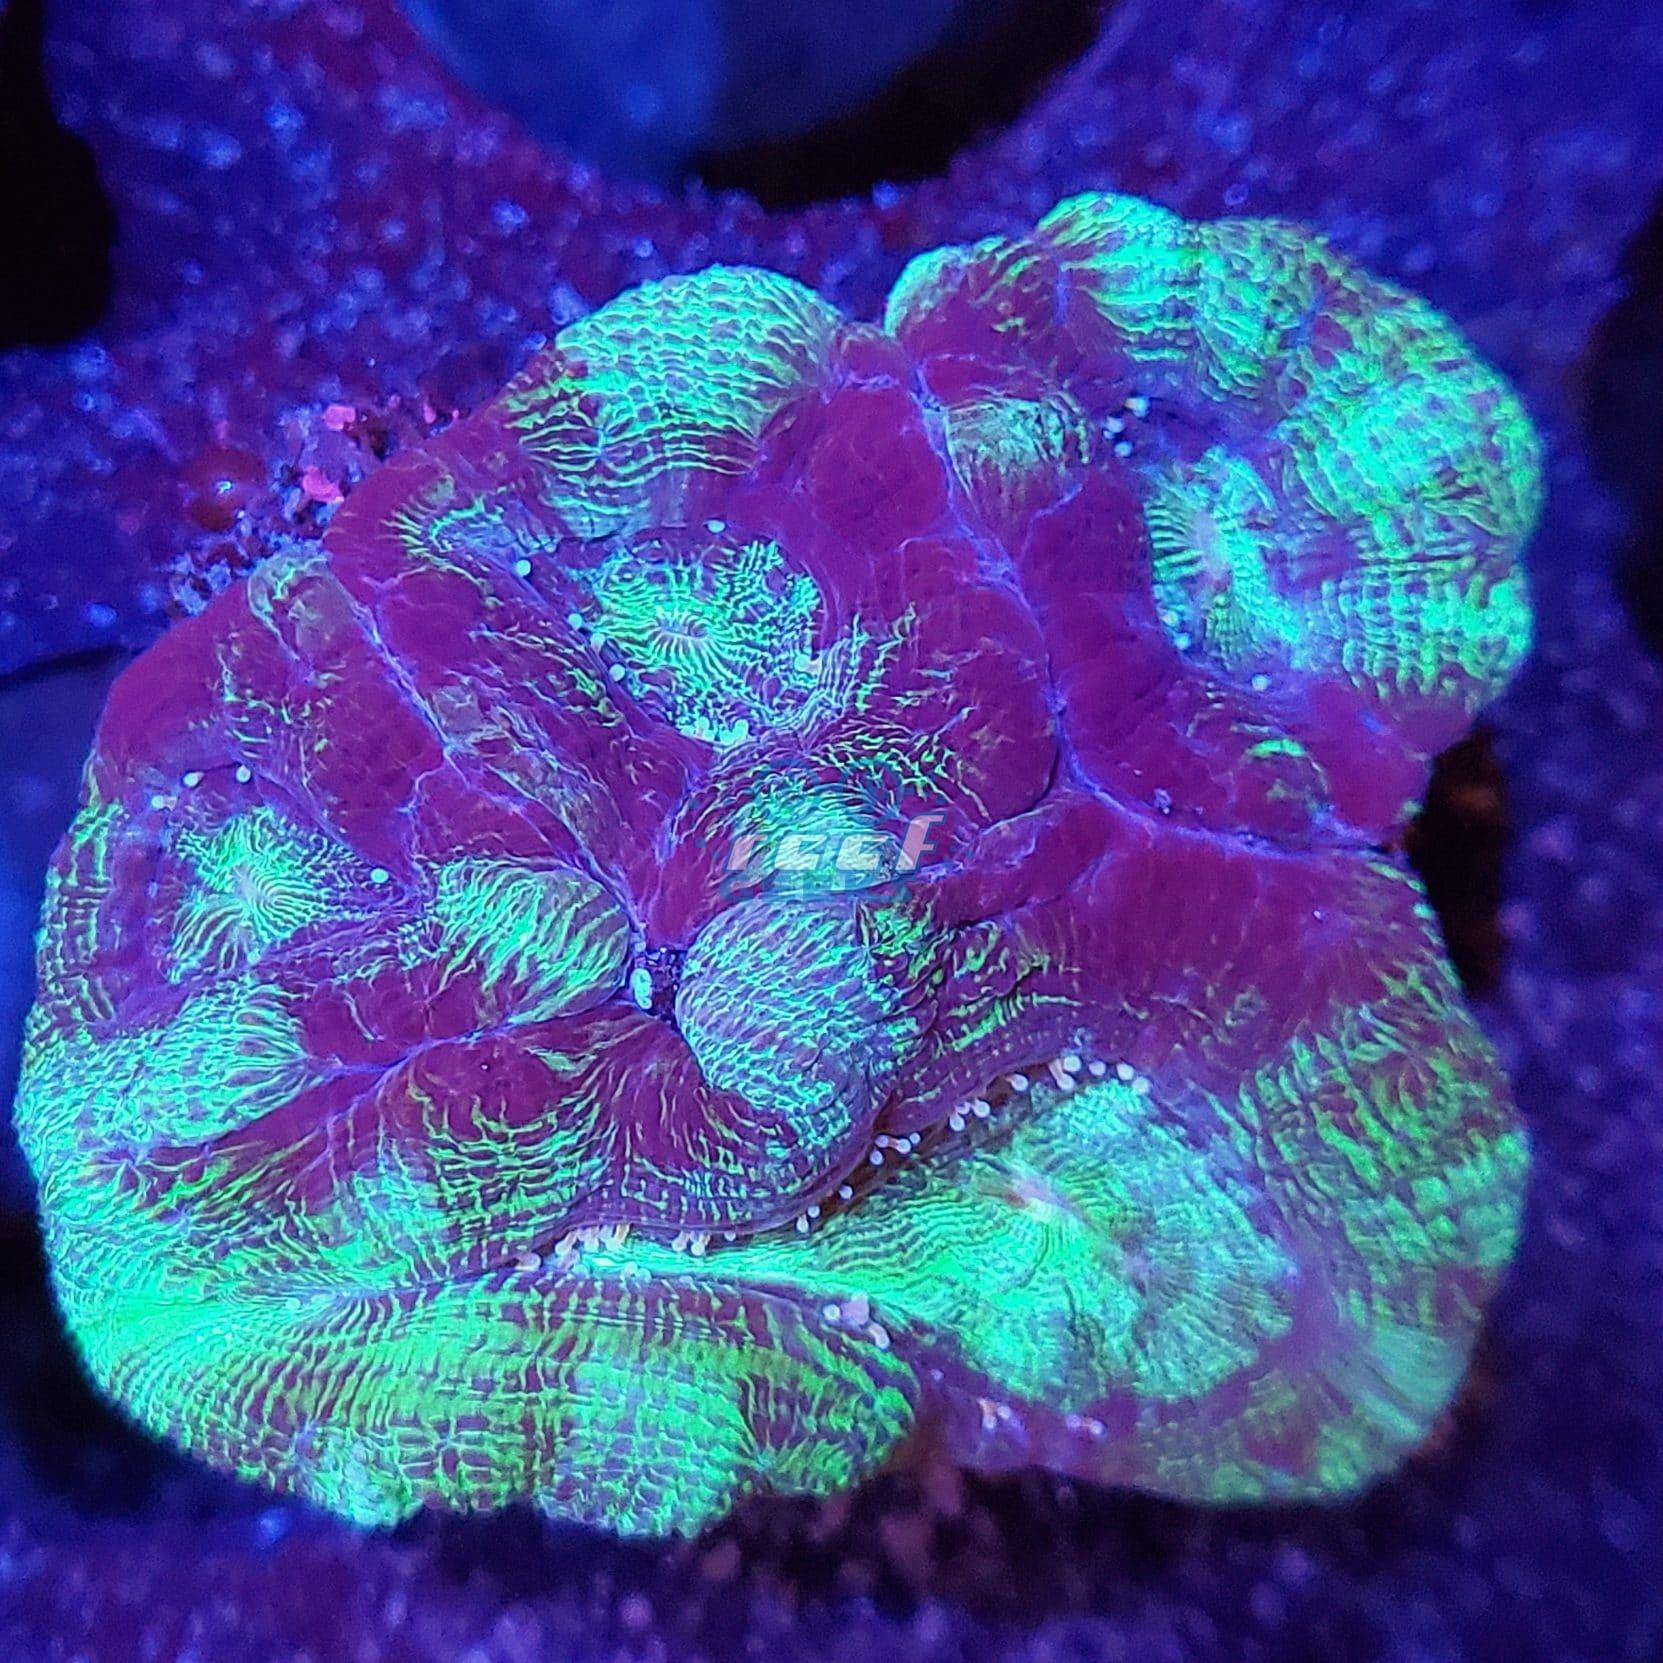 Green & Purple Infusion Acan Bowerbanki WYSIWYG